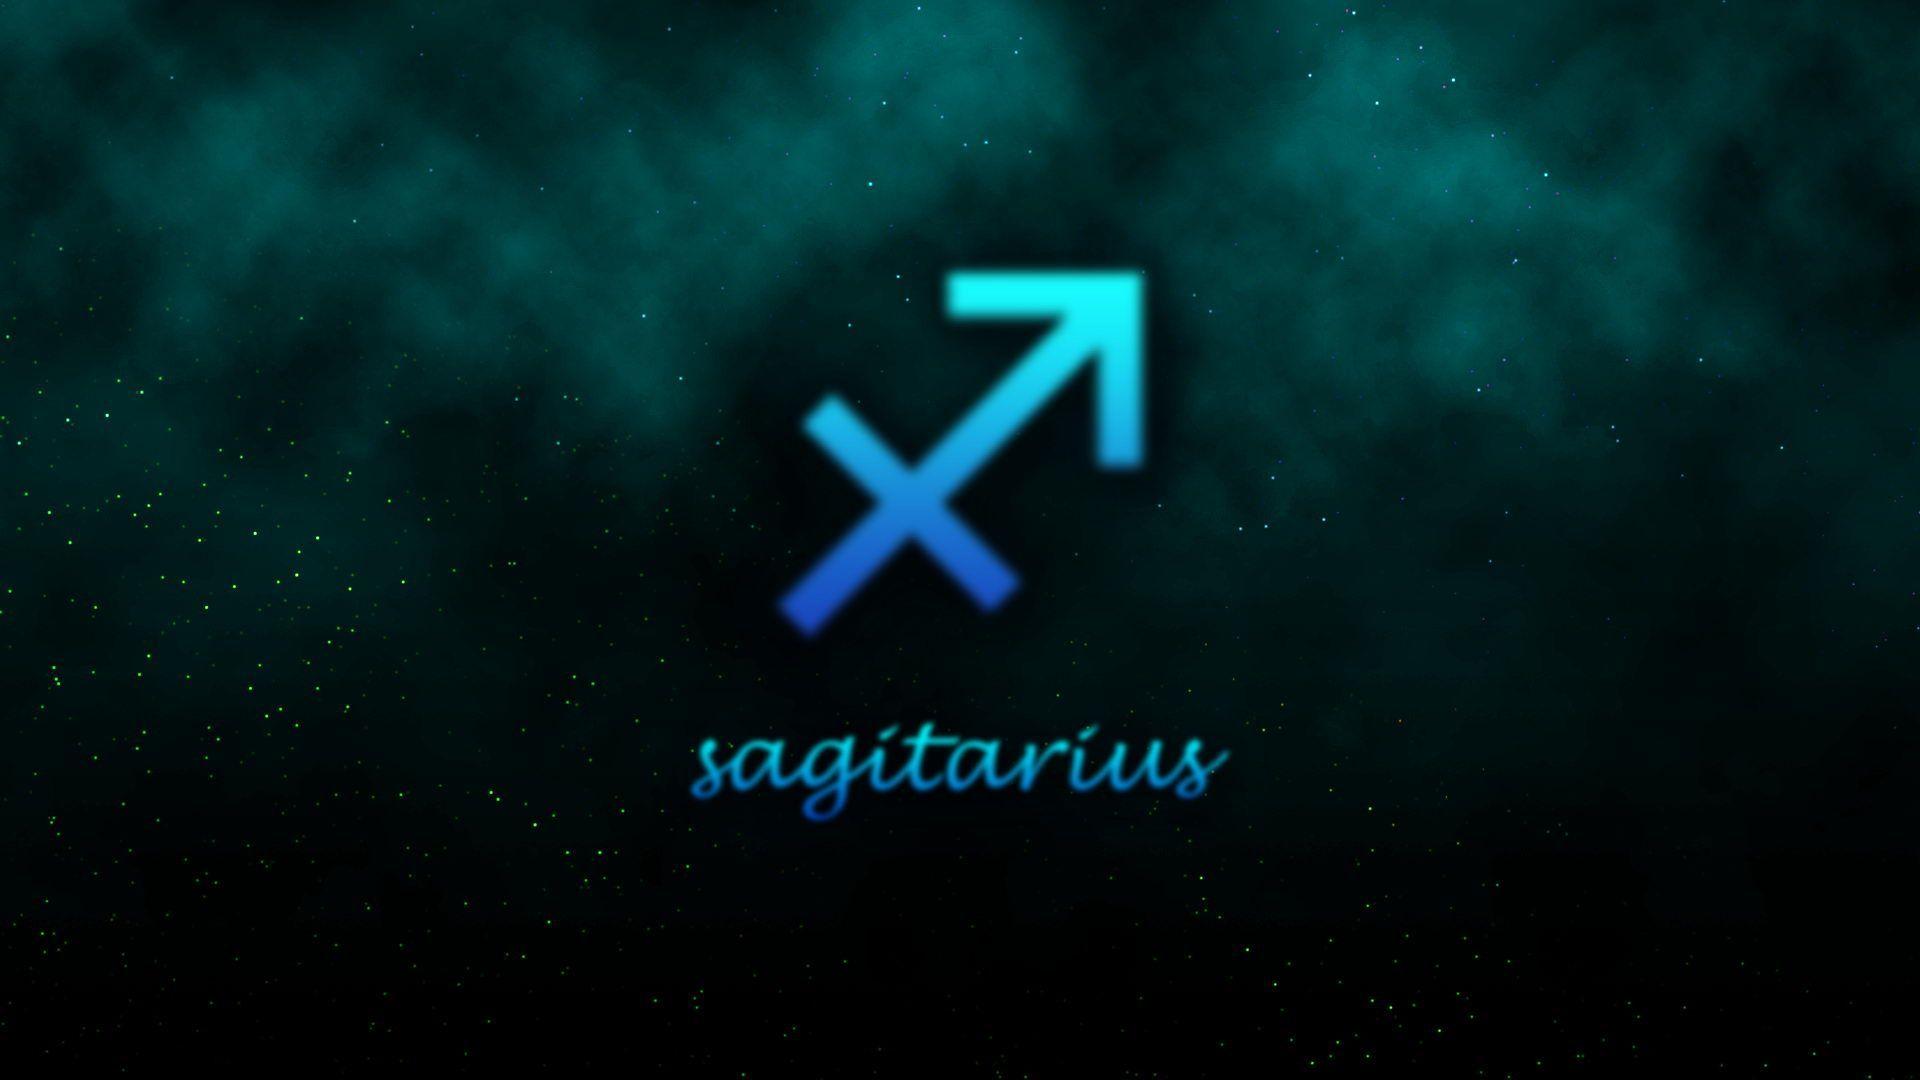 Sagittarius Photos Download Wallpapers Free